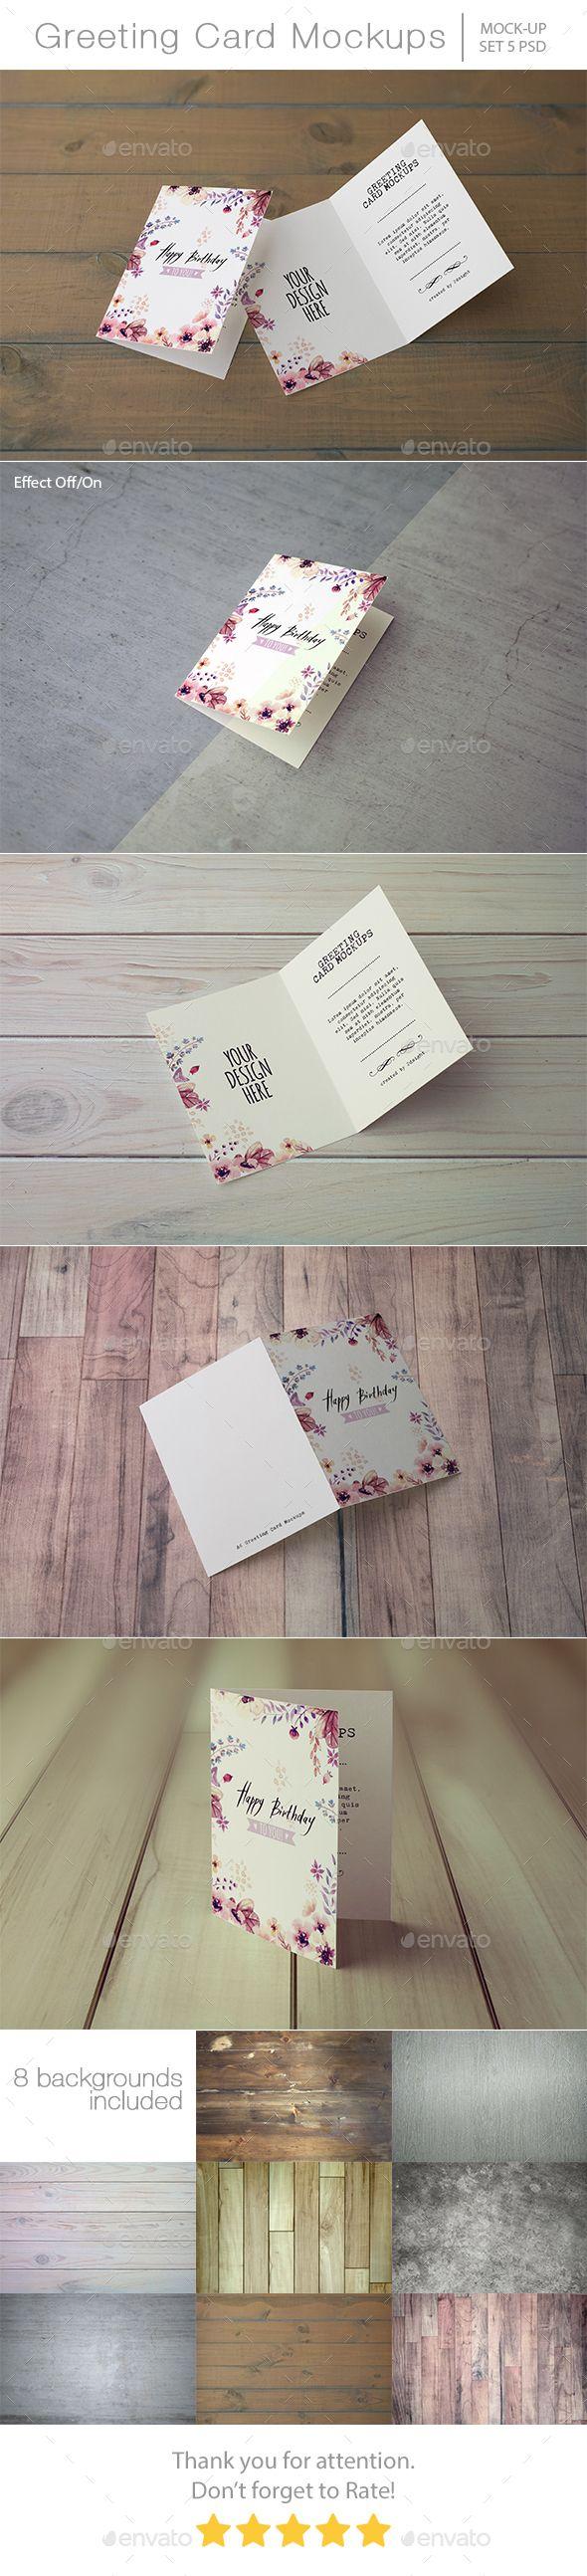 208 best mockup images on pinterest miniatures mockup and model invitation greeting card mockups stopboris Choice Image